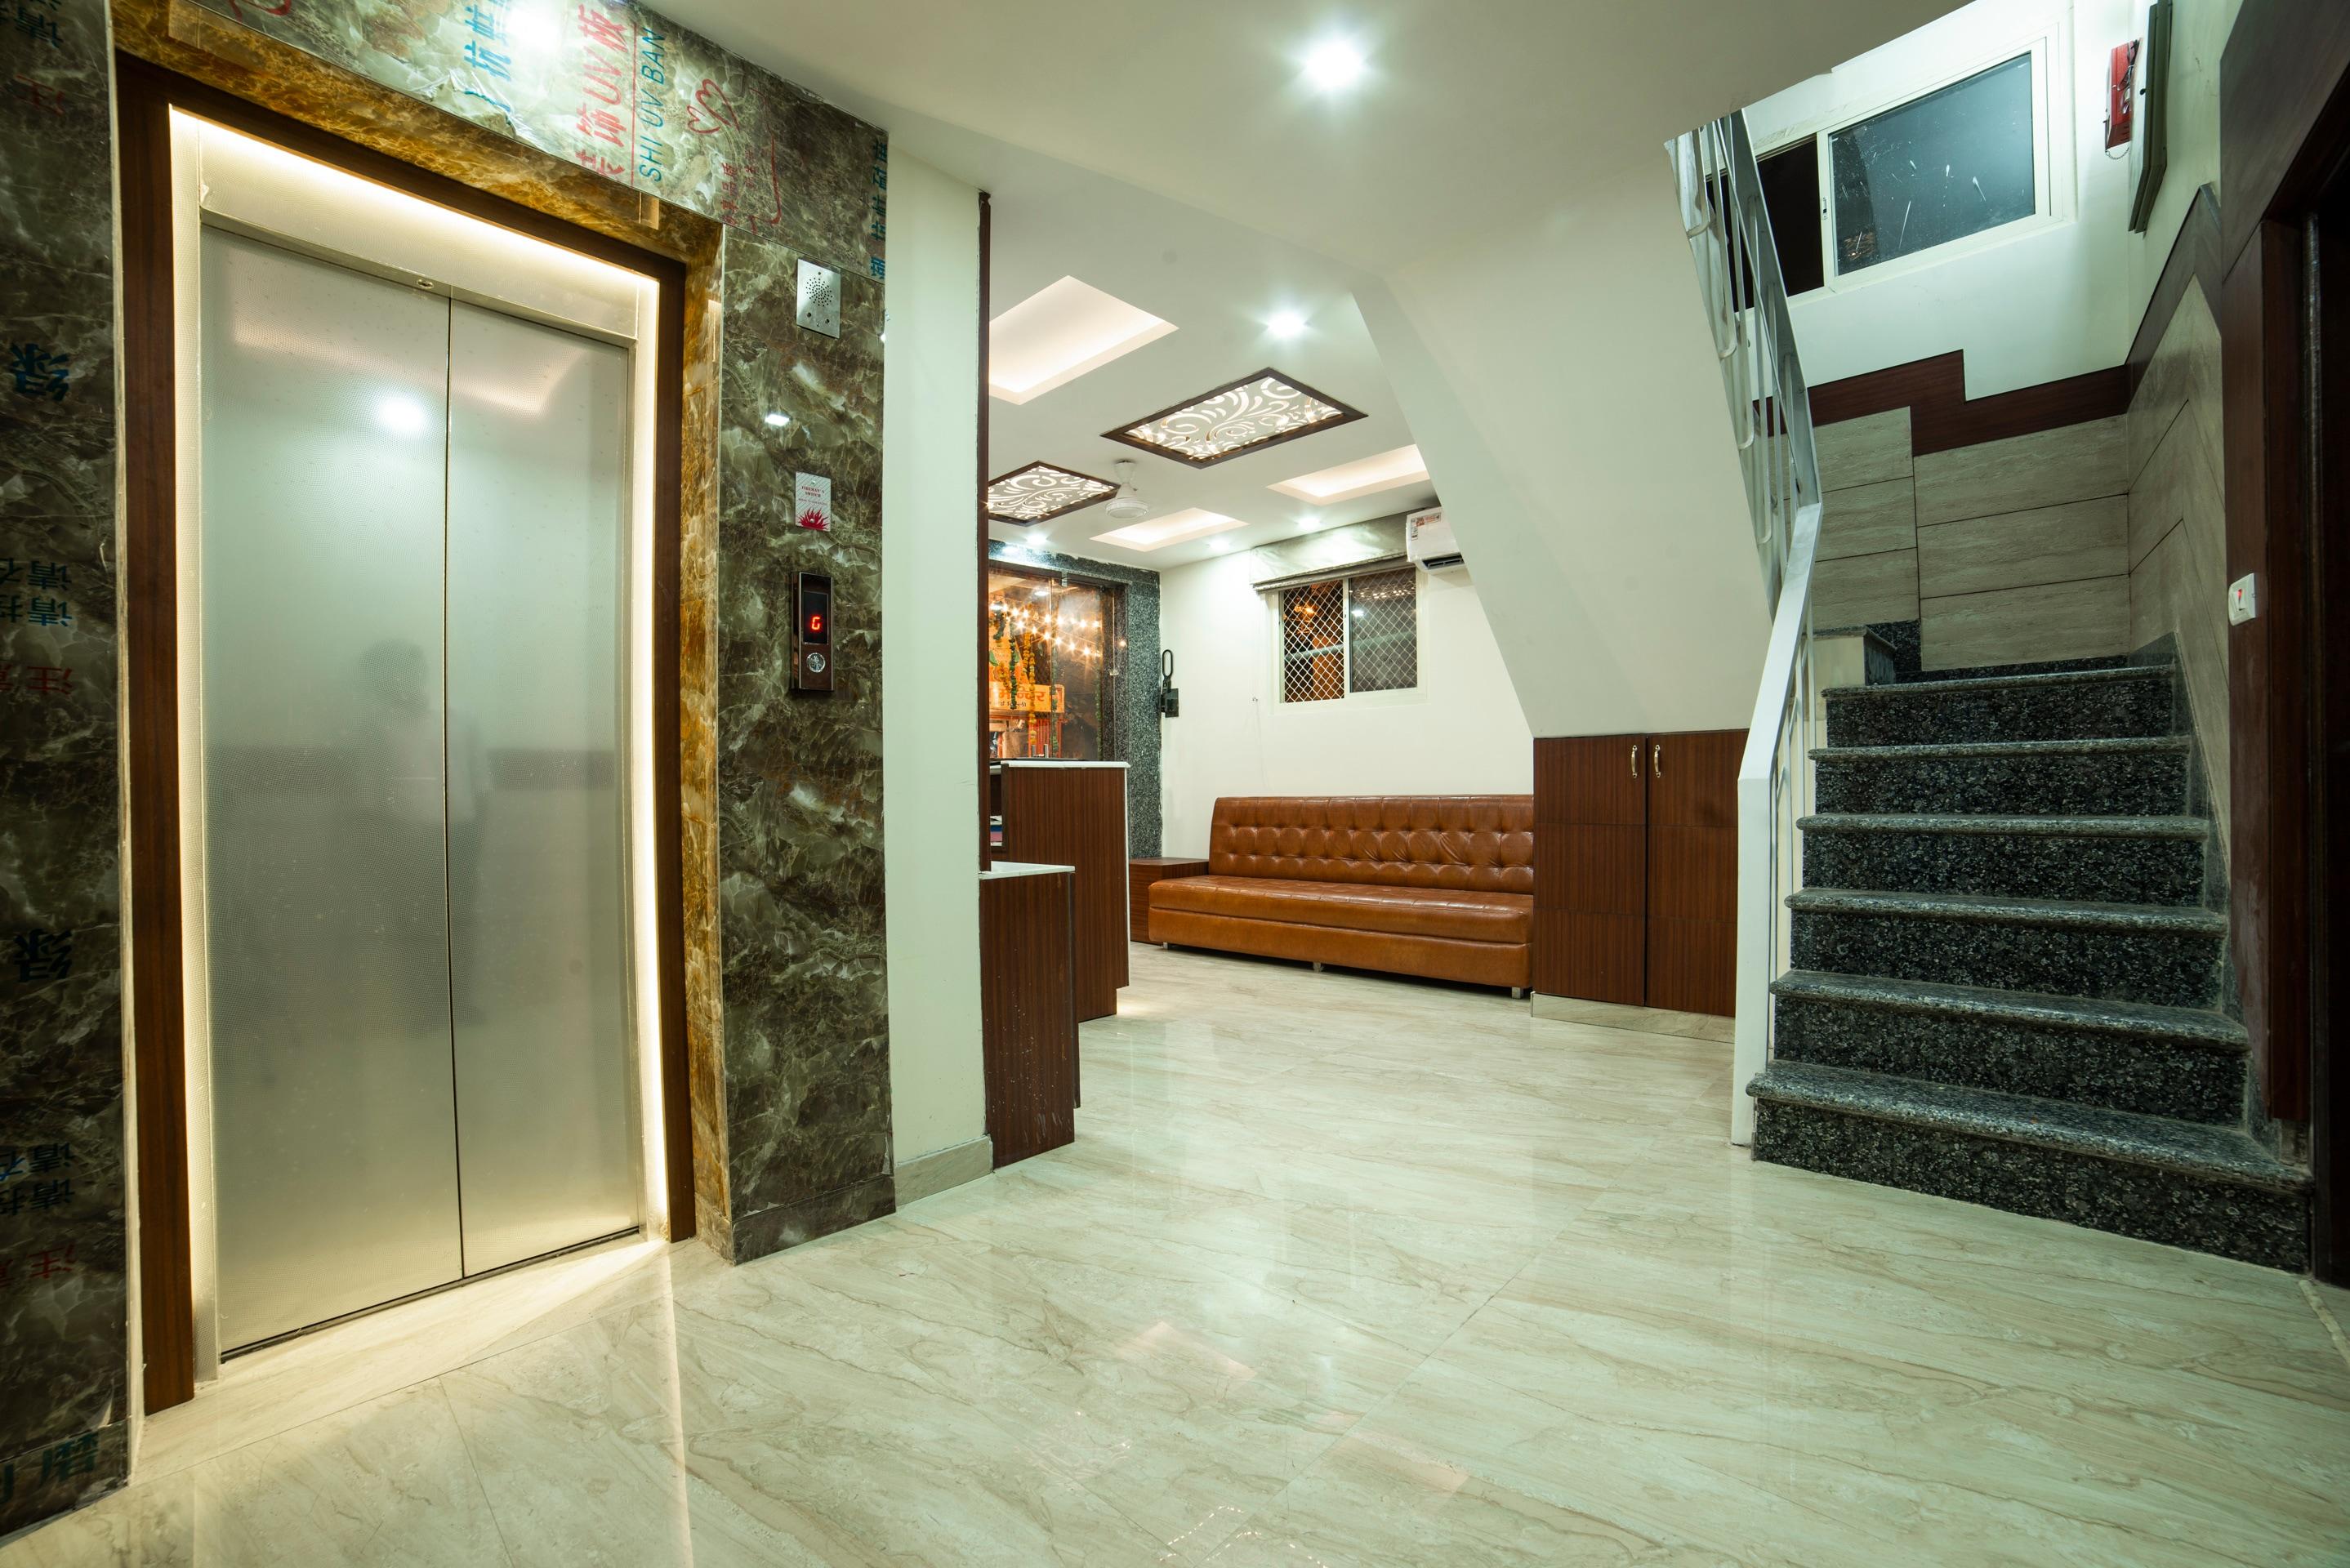 Oyo 14136 Hotel Toto International New Delhi Hotel Booking - Reviews ...